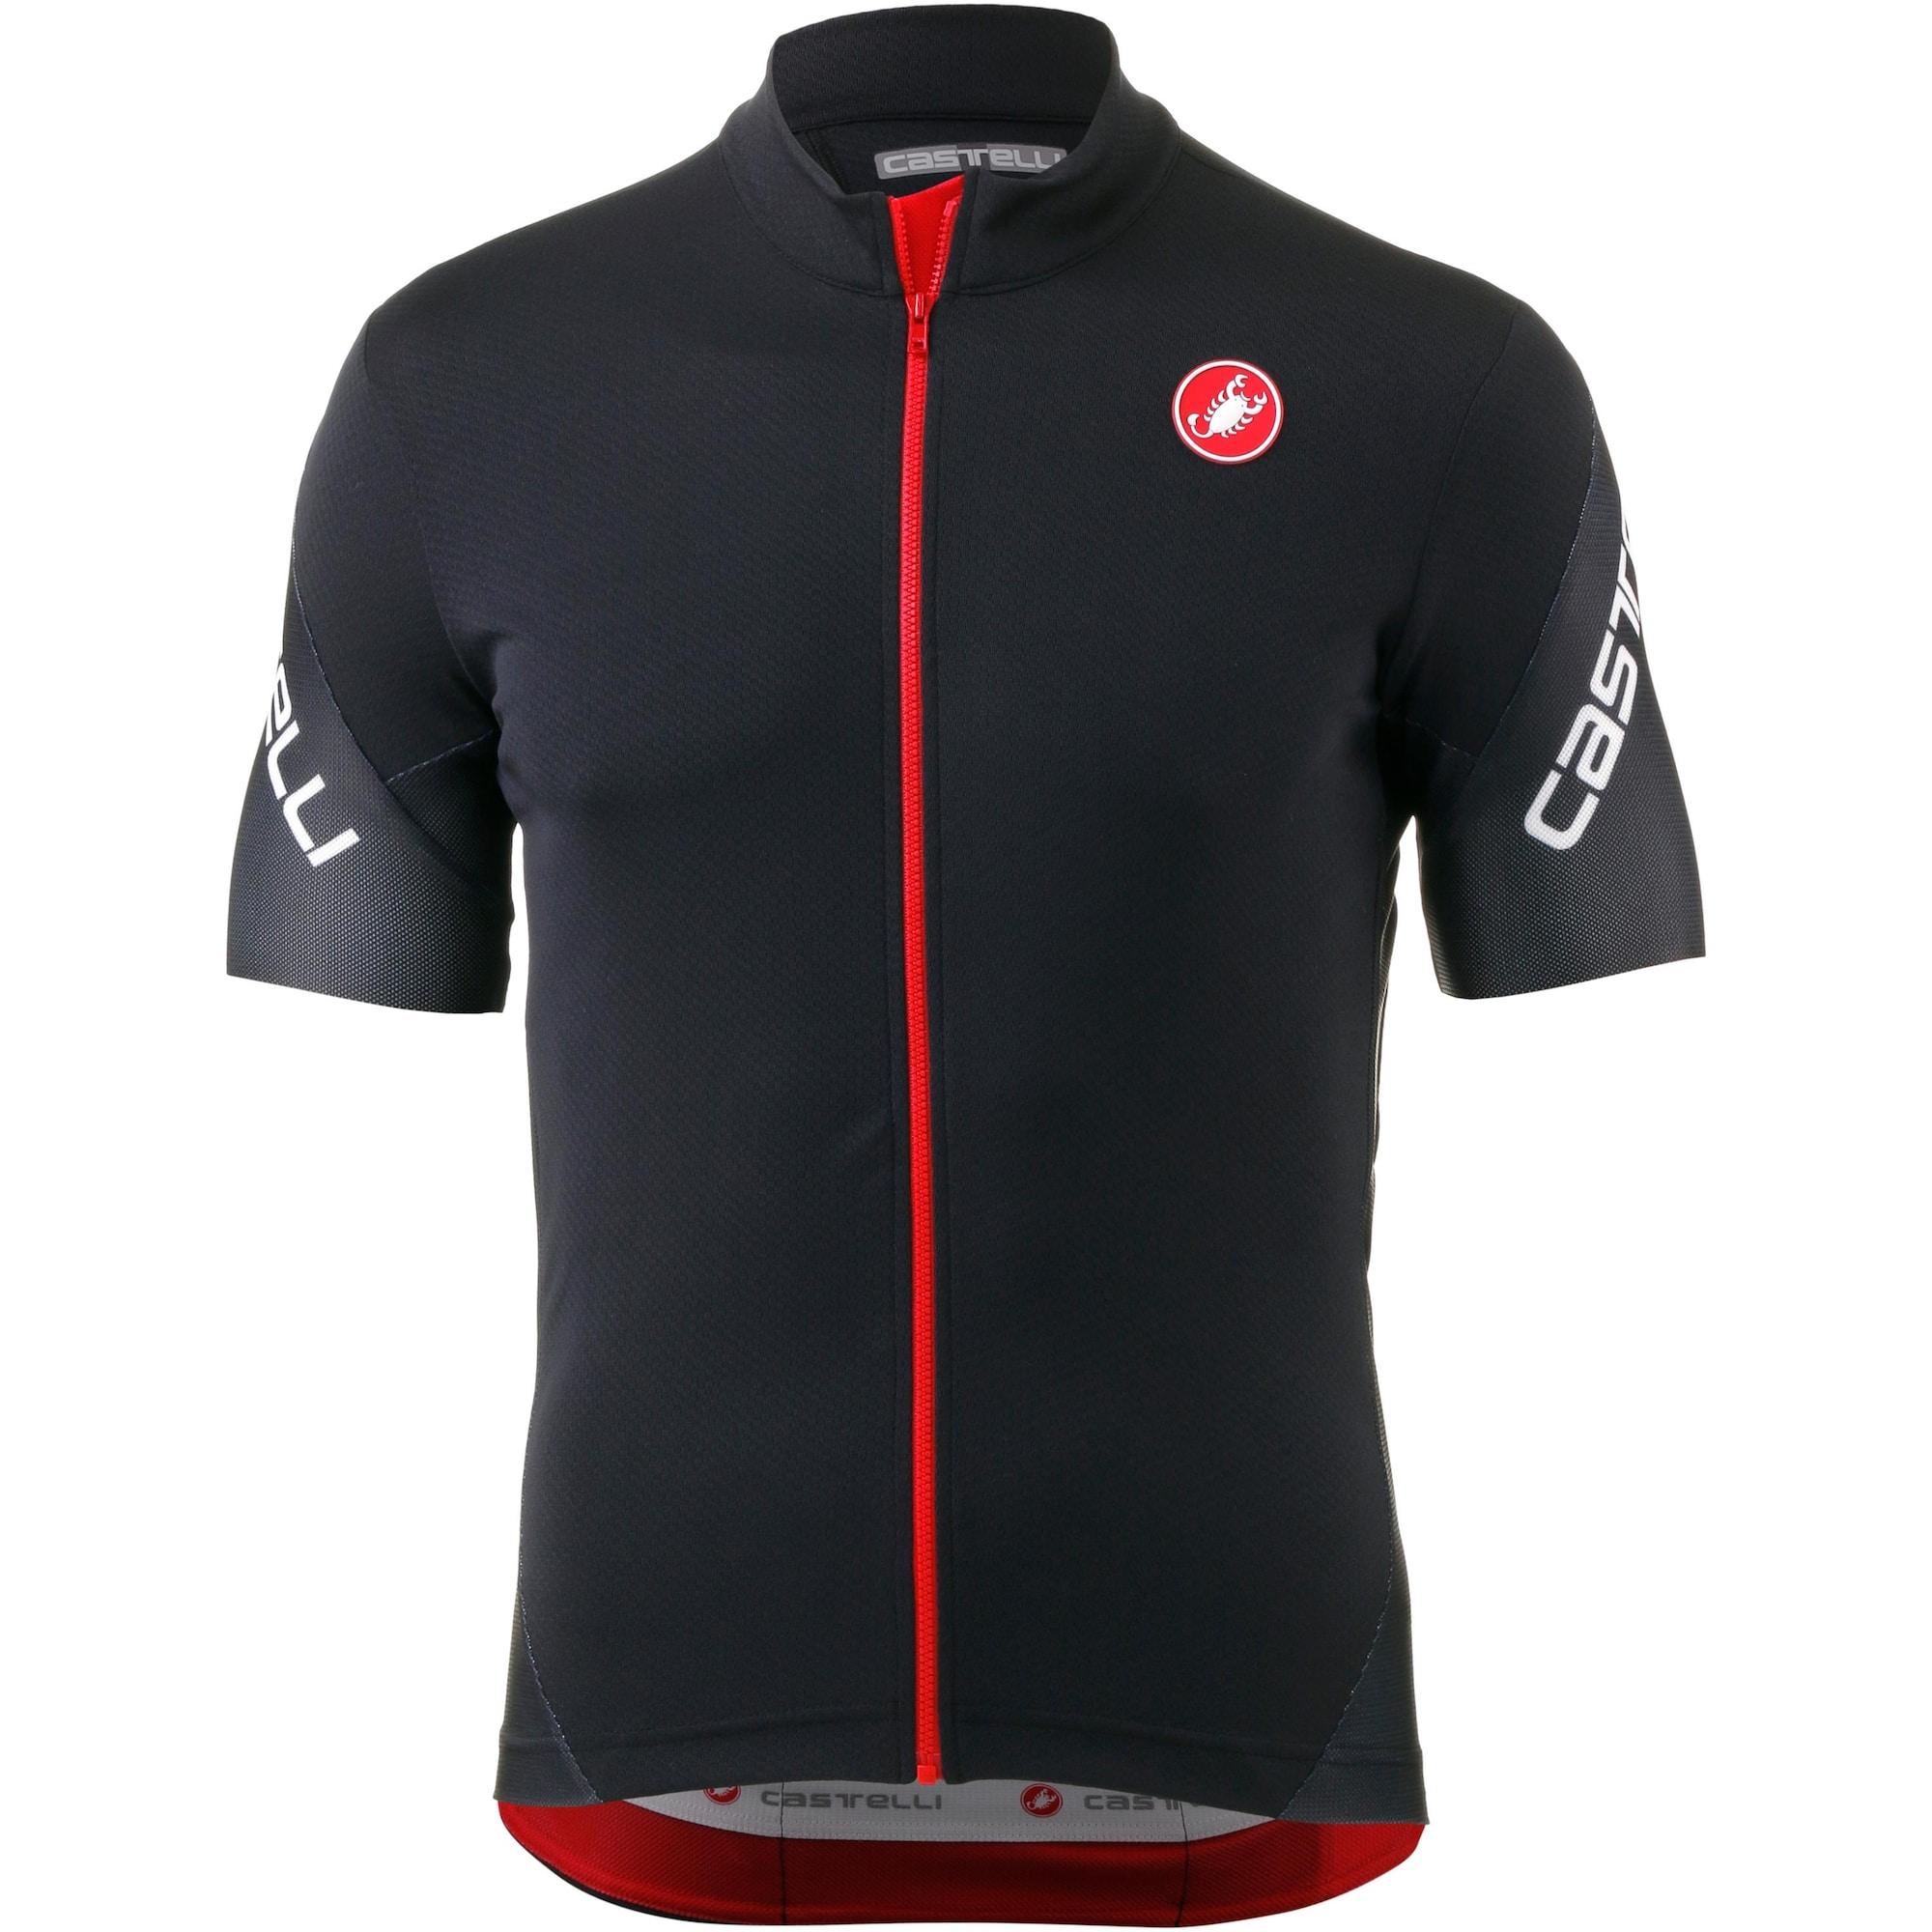 Fahrradtrikot 'Entrata' | Sportbekleidung > Trikots > Fahrradtrikots | Castelli